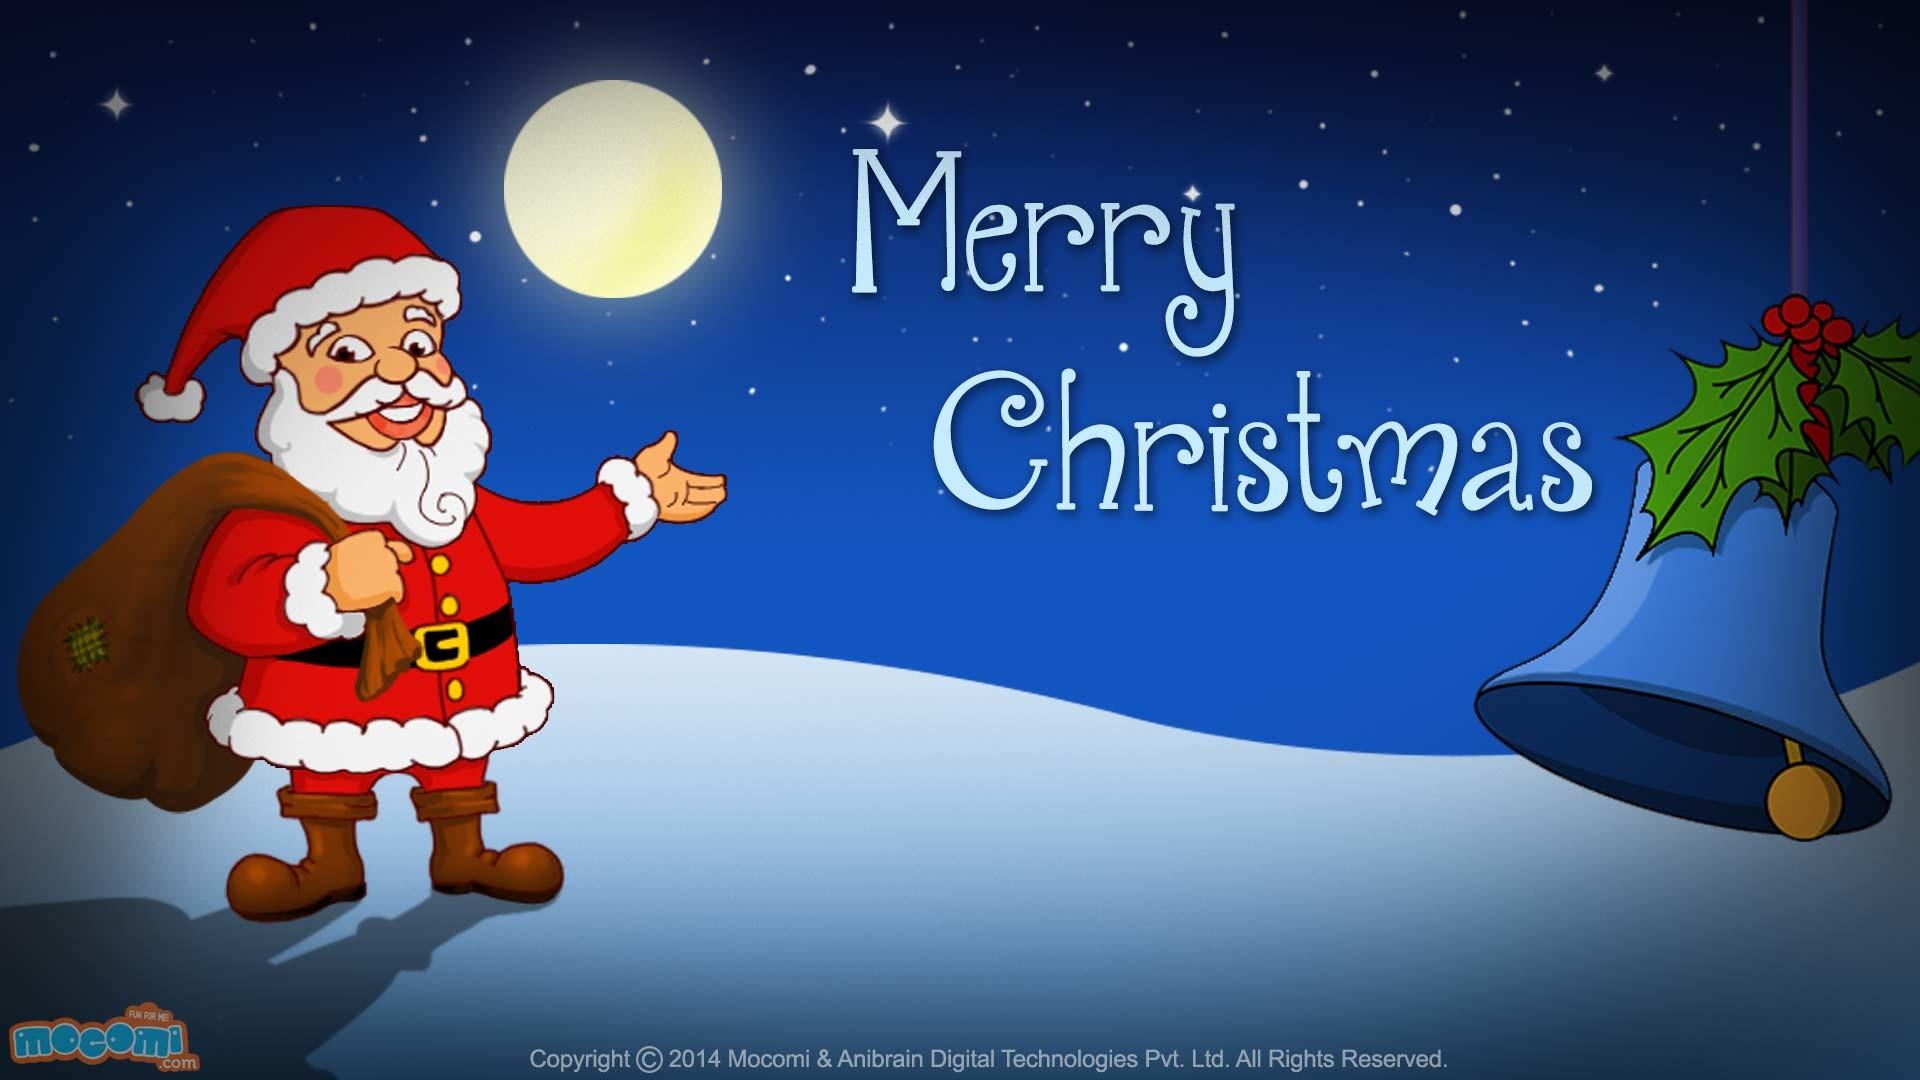 Merry Christmas- Santa Claus